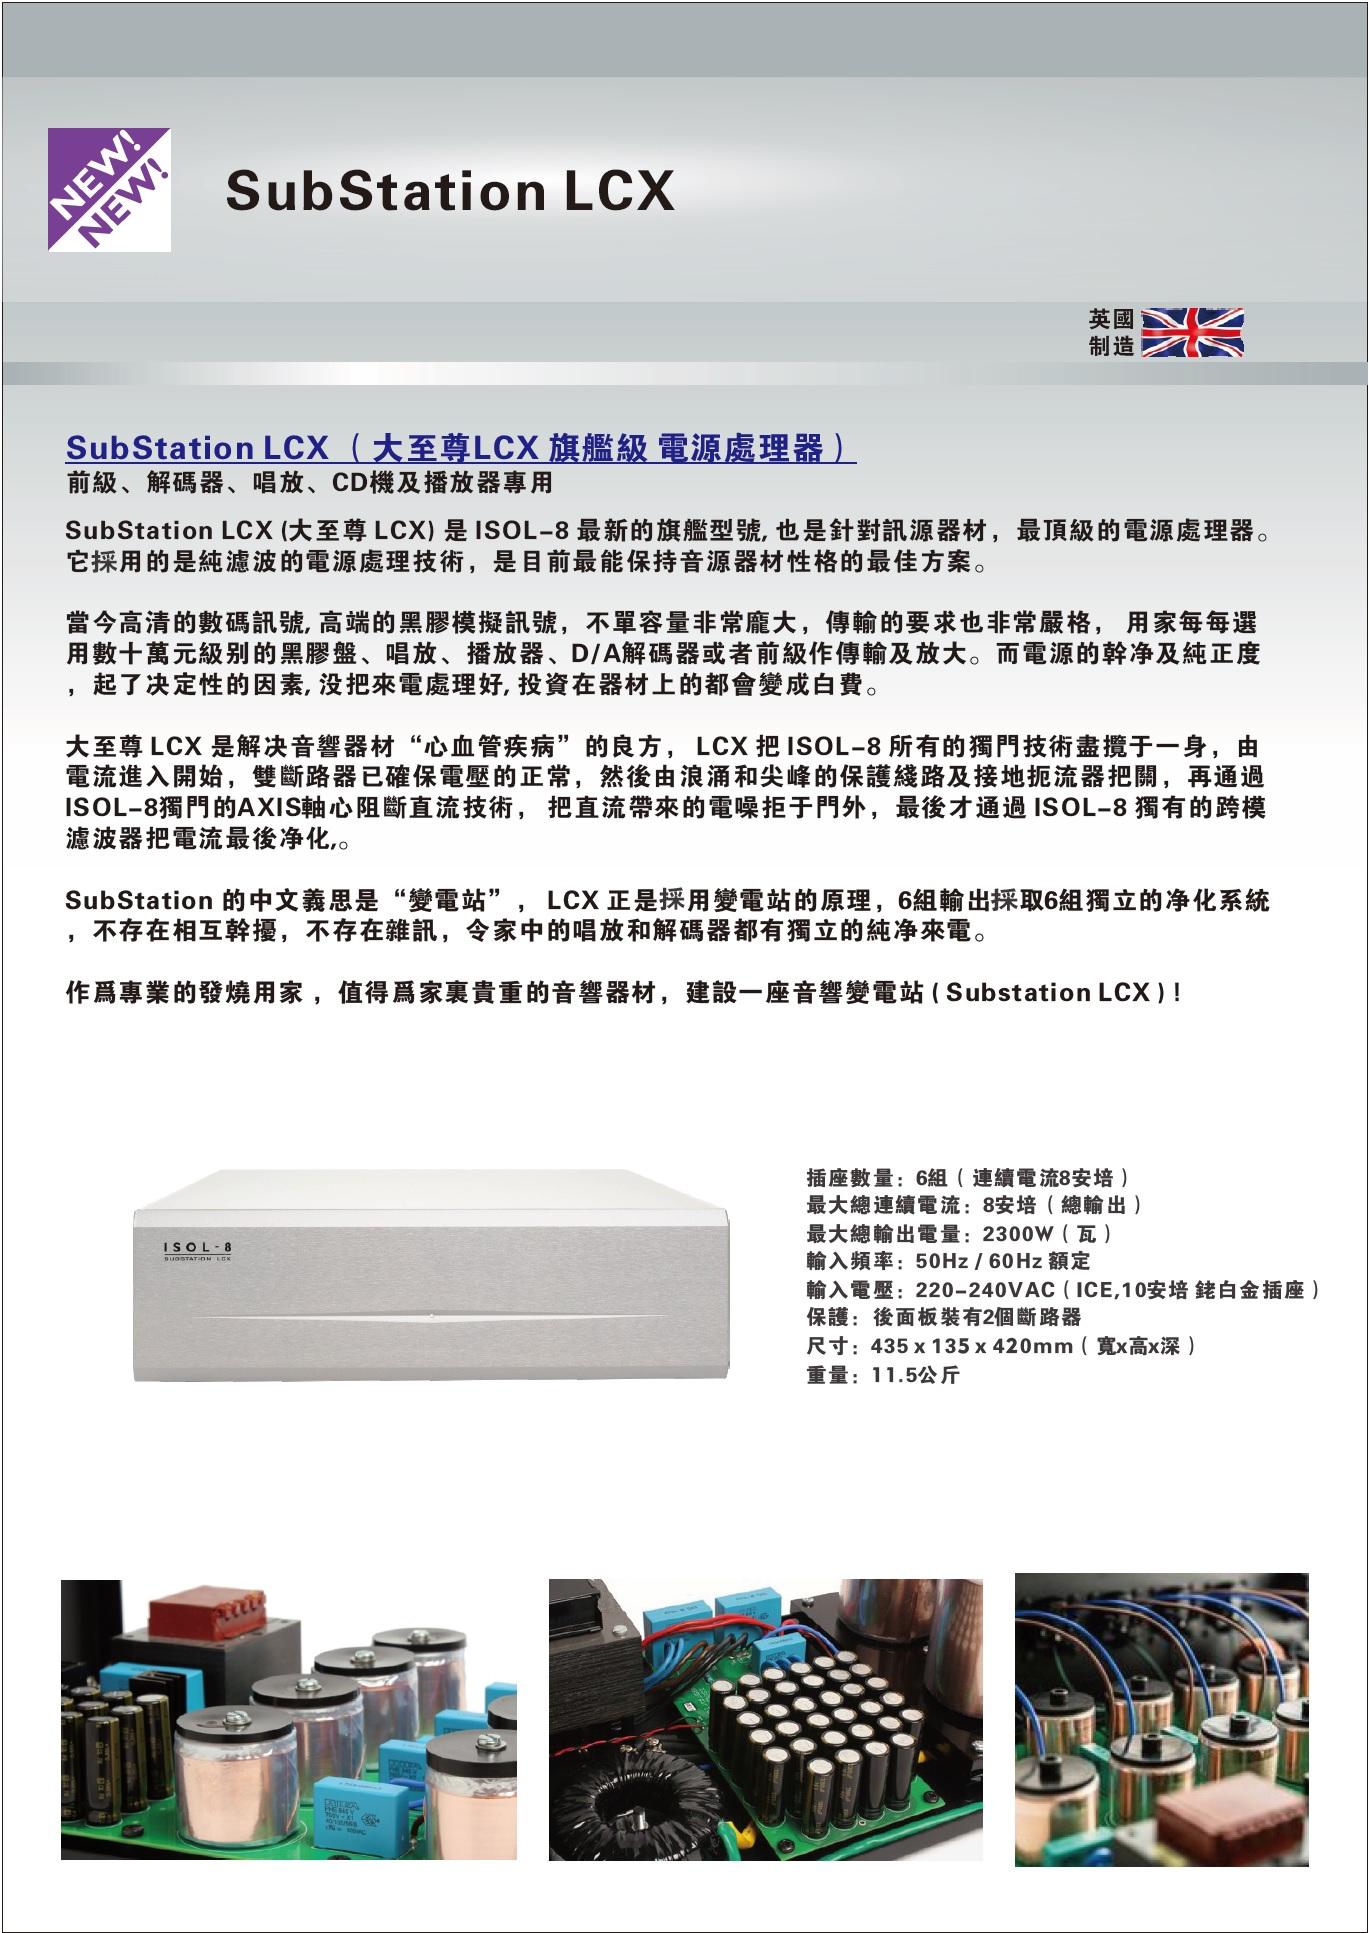 SubStation LCX